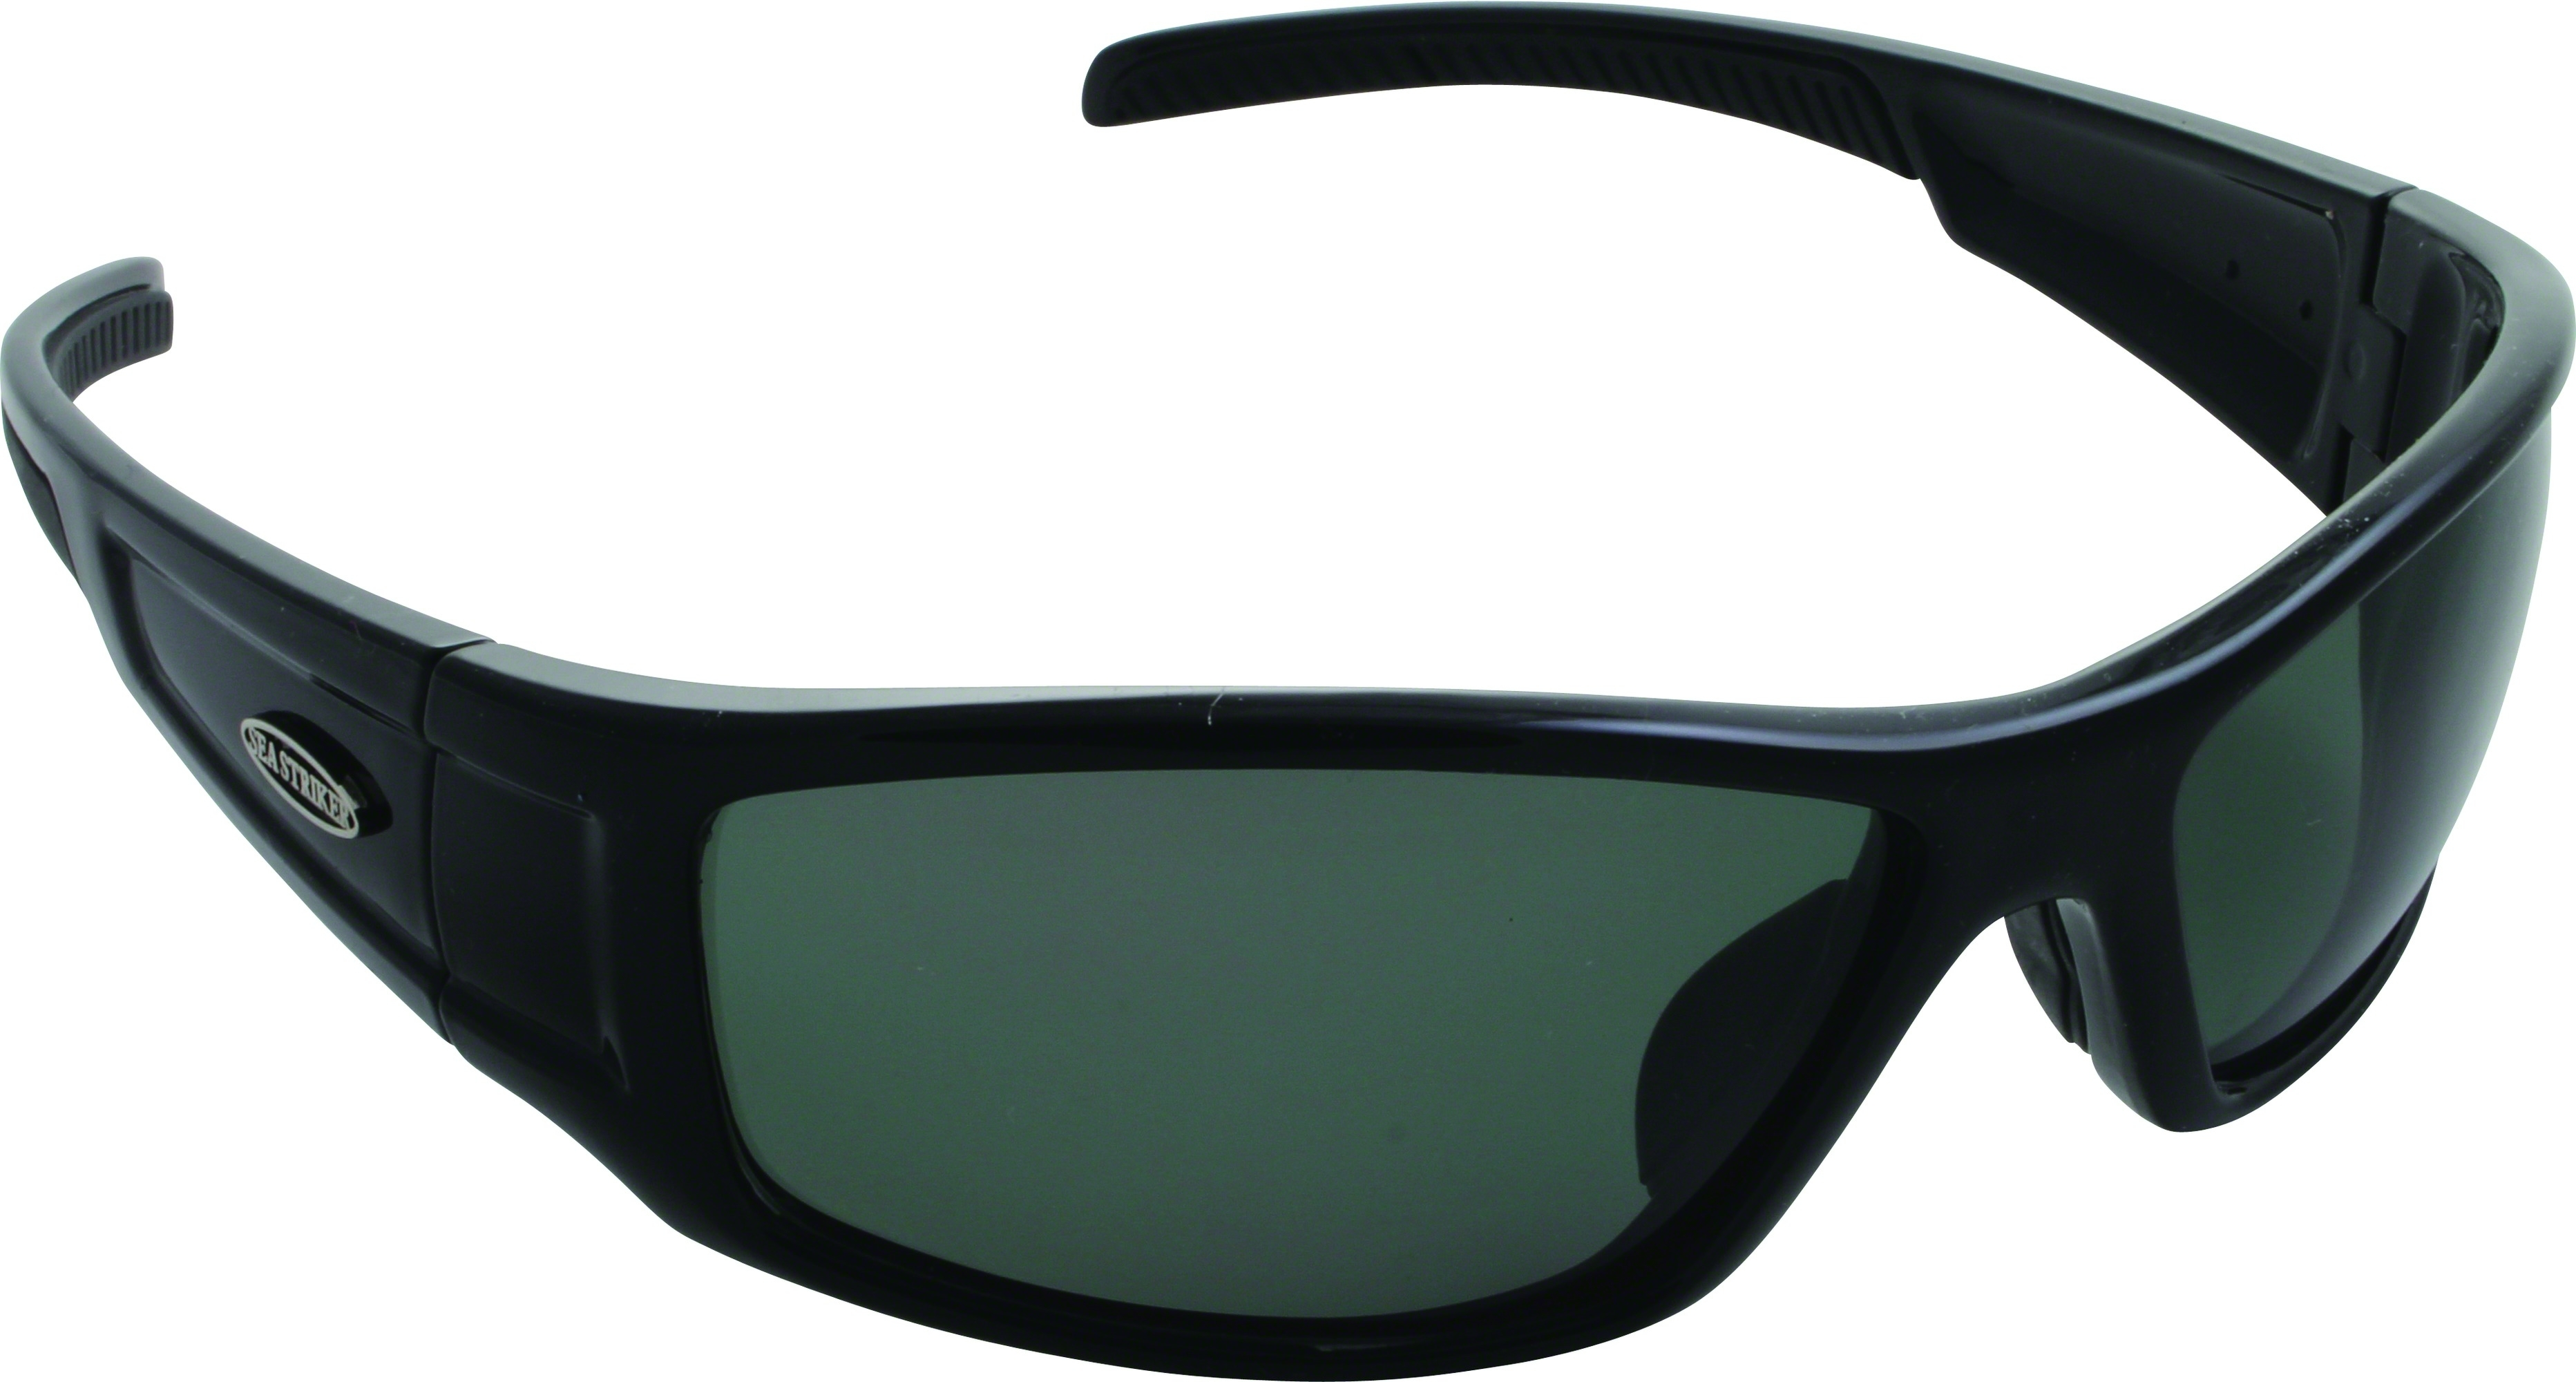 0ea66d524669 Details about Sea Striker 287 Sea Star Sunglasses Black Grey Lenses  Polarized